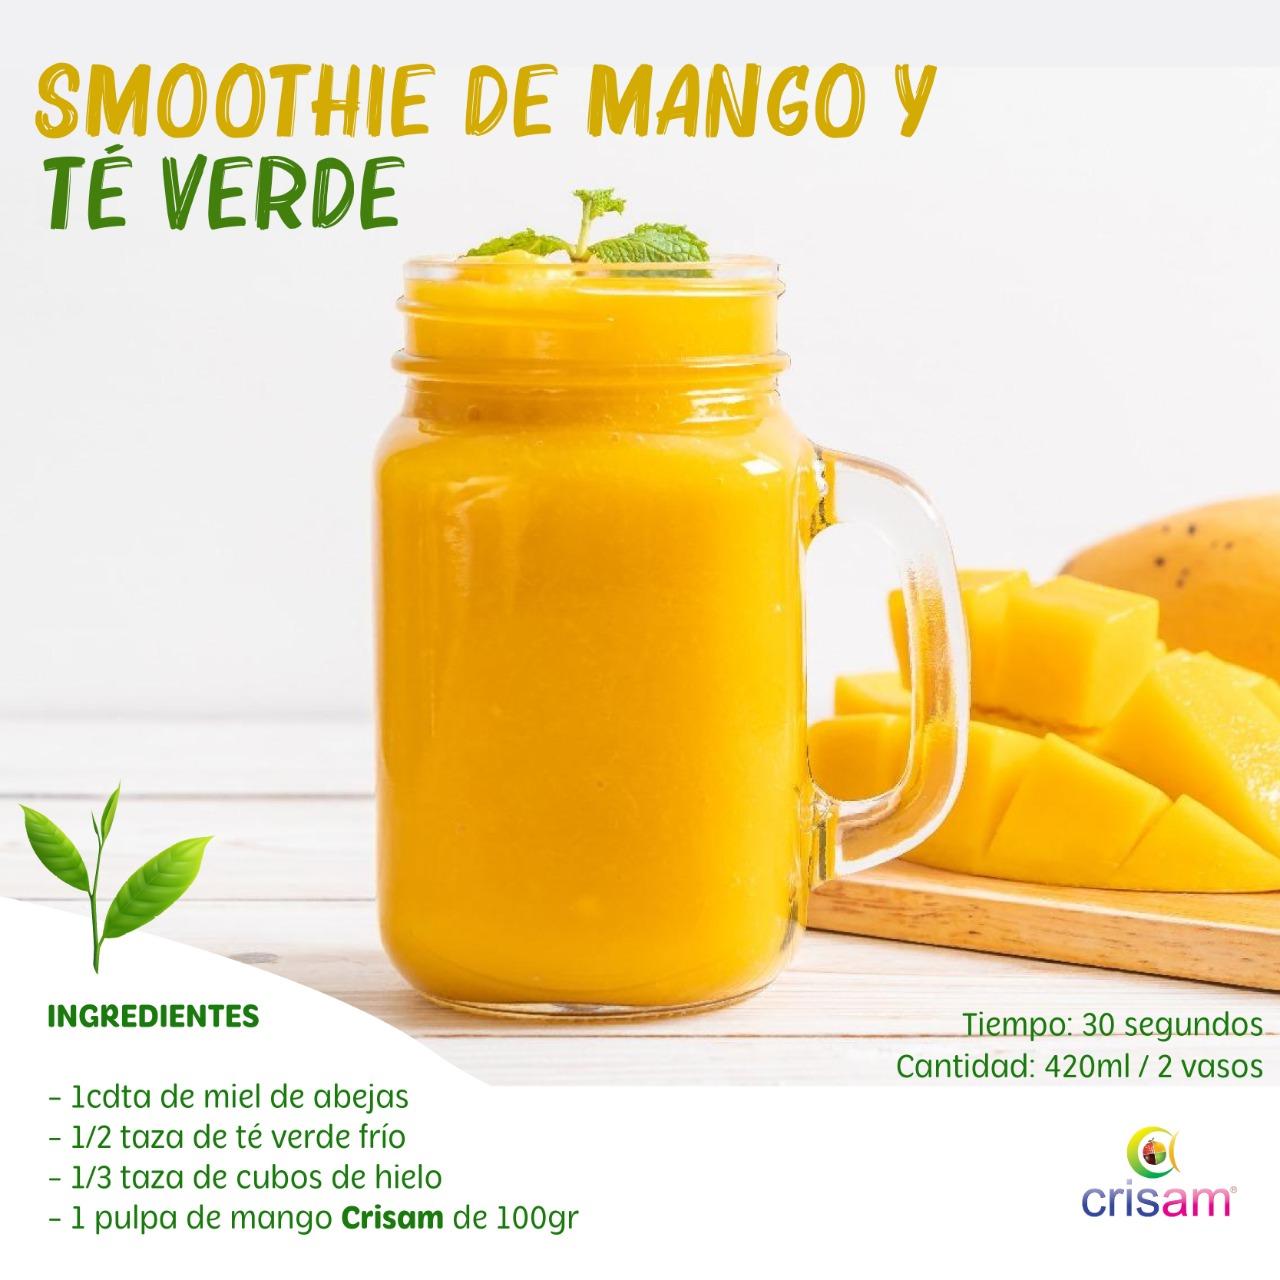 Smoothie de Mango y Té Verde